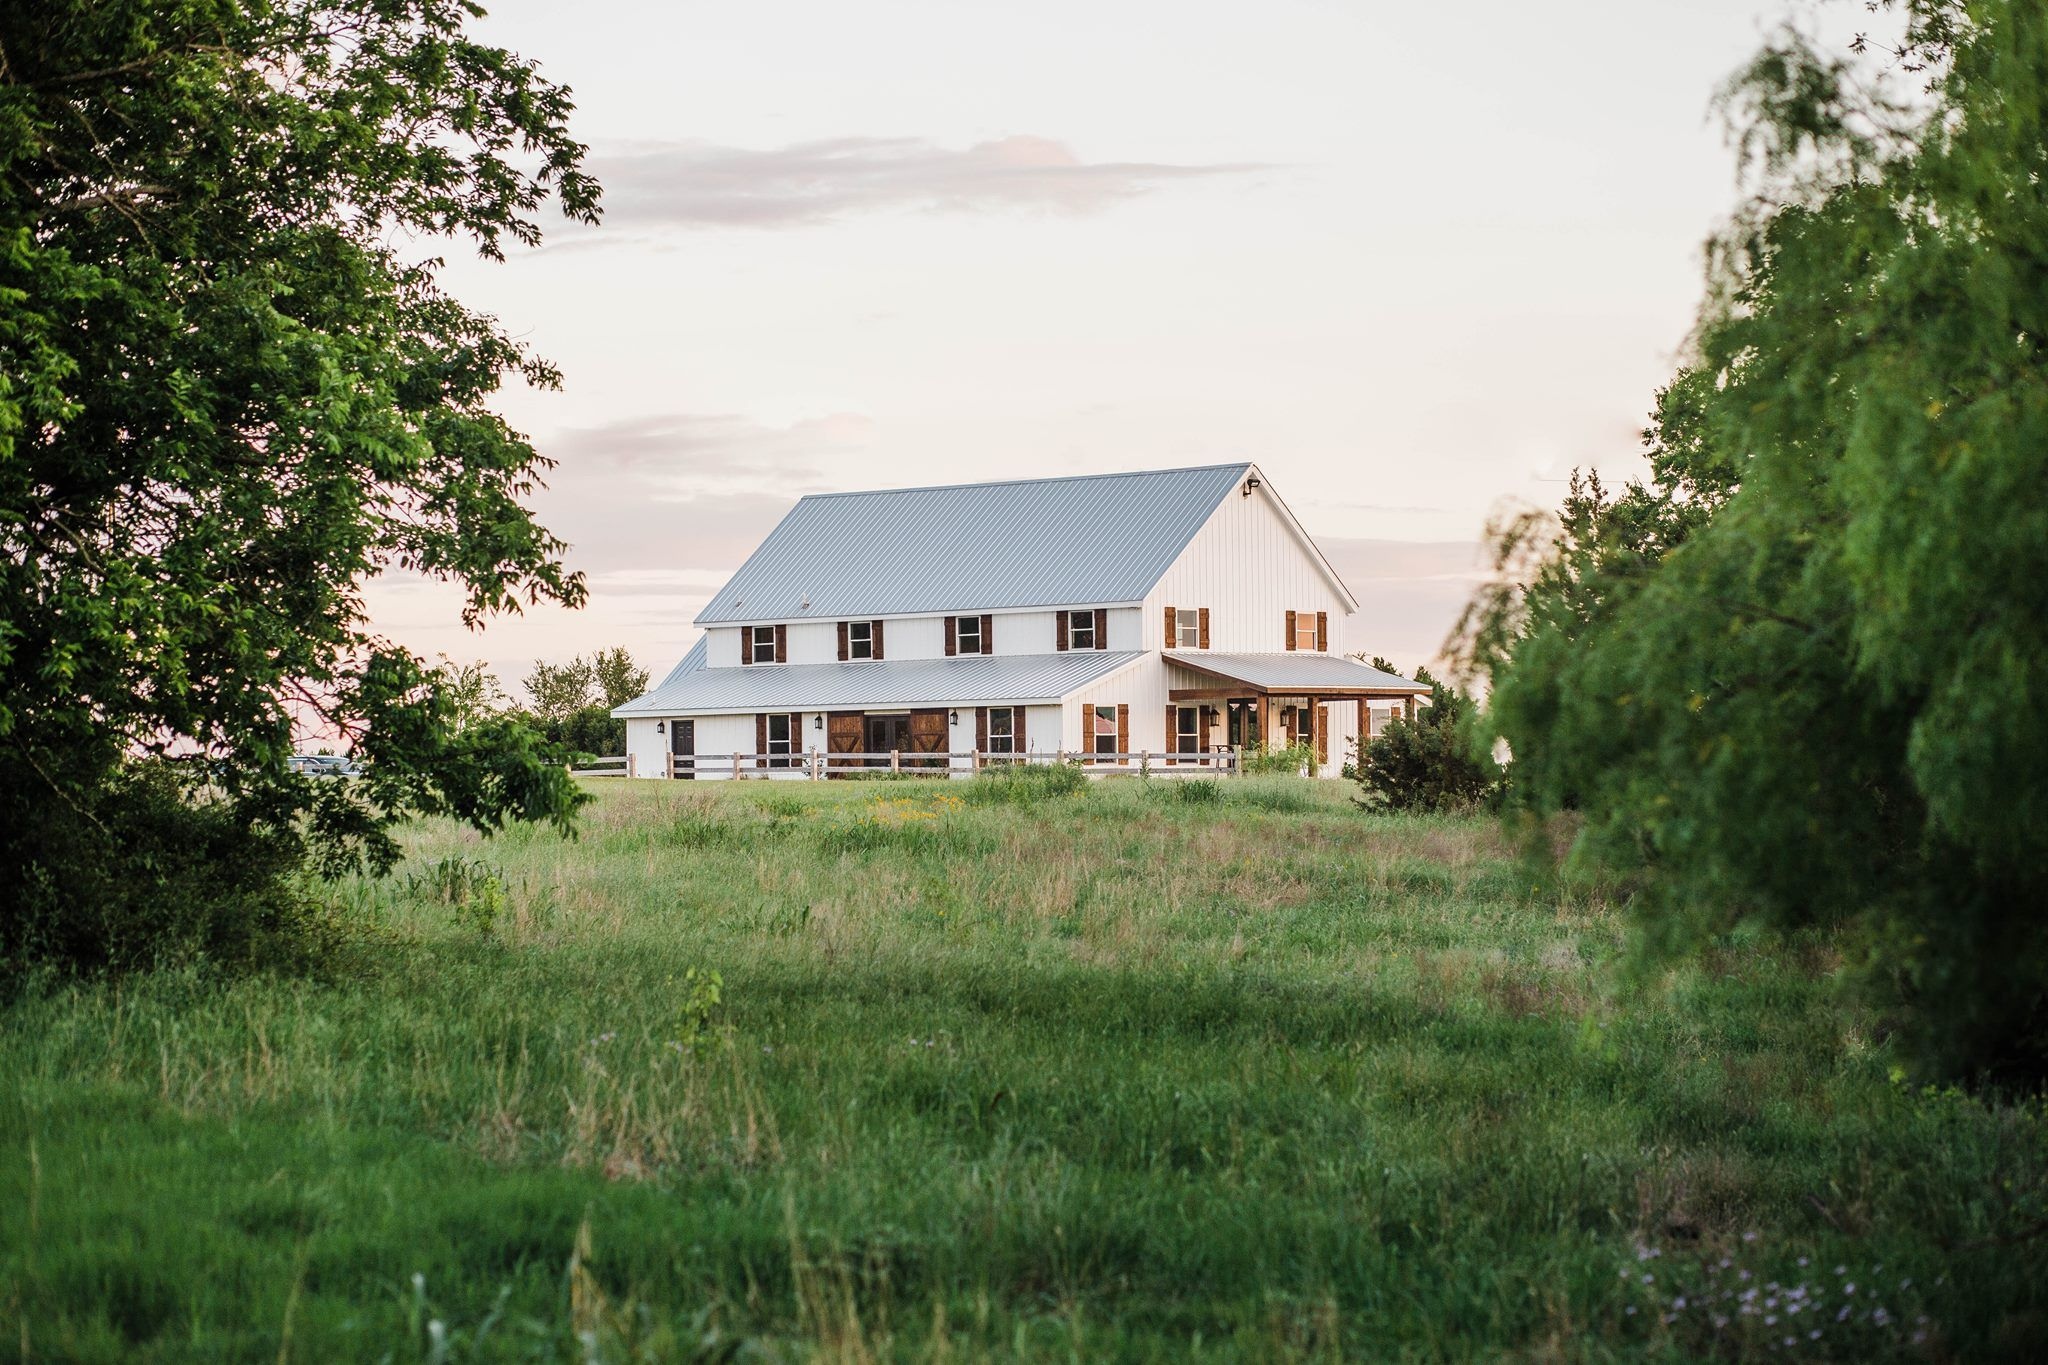 Farmhouse Style Wedding Inspiration at Five Oaks Farm